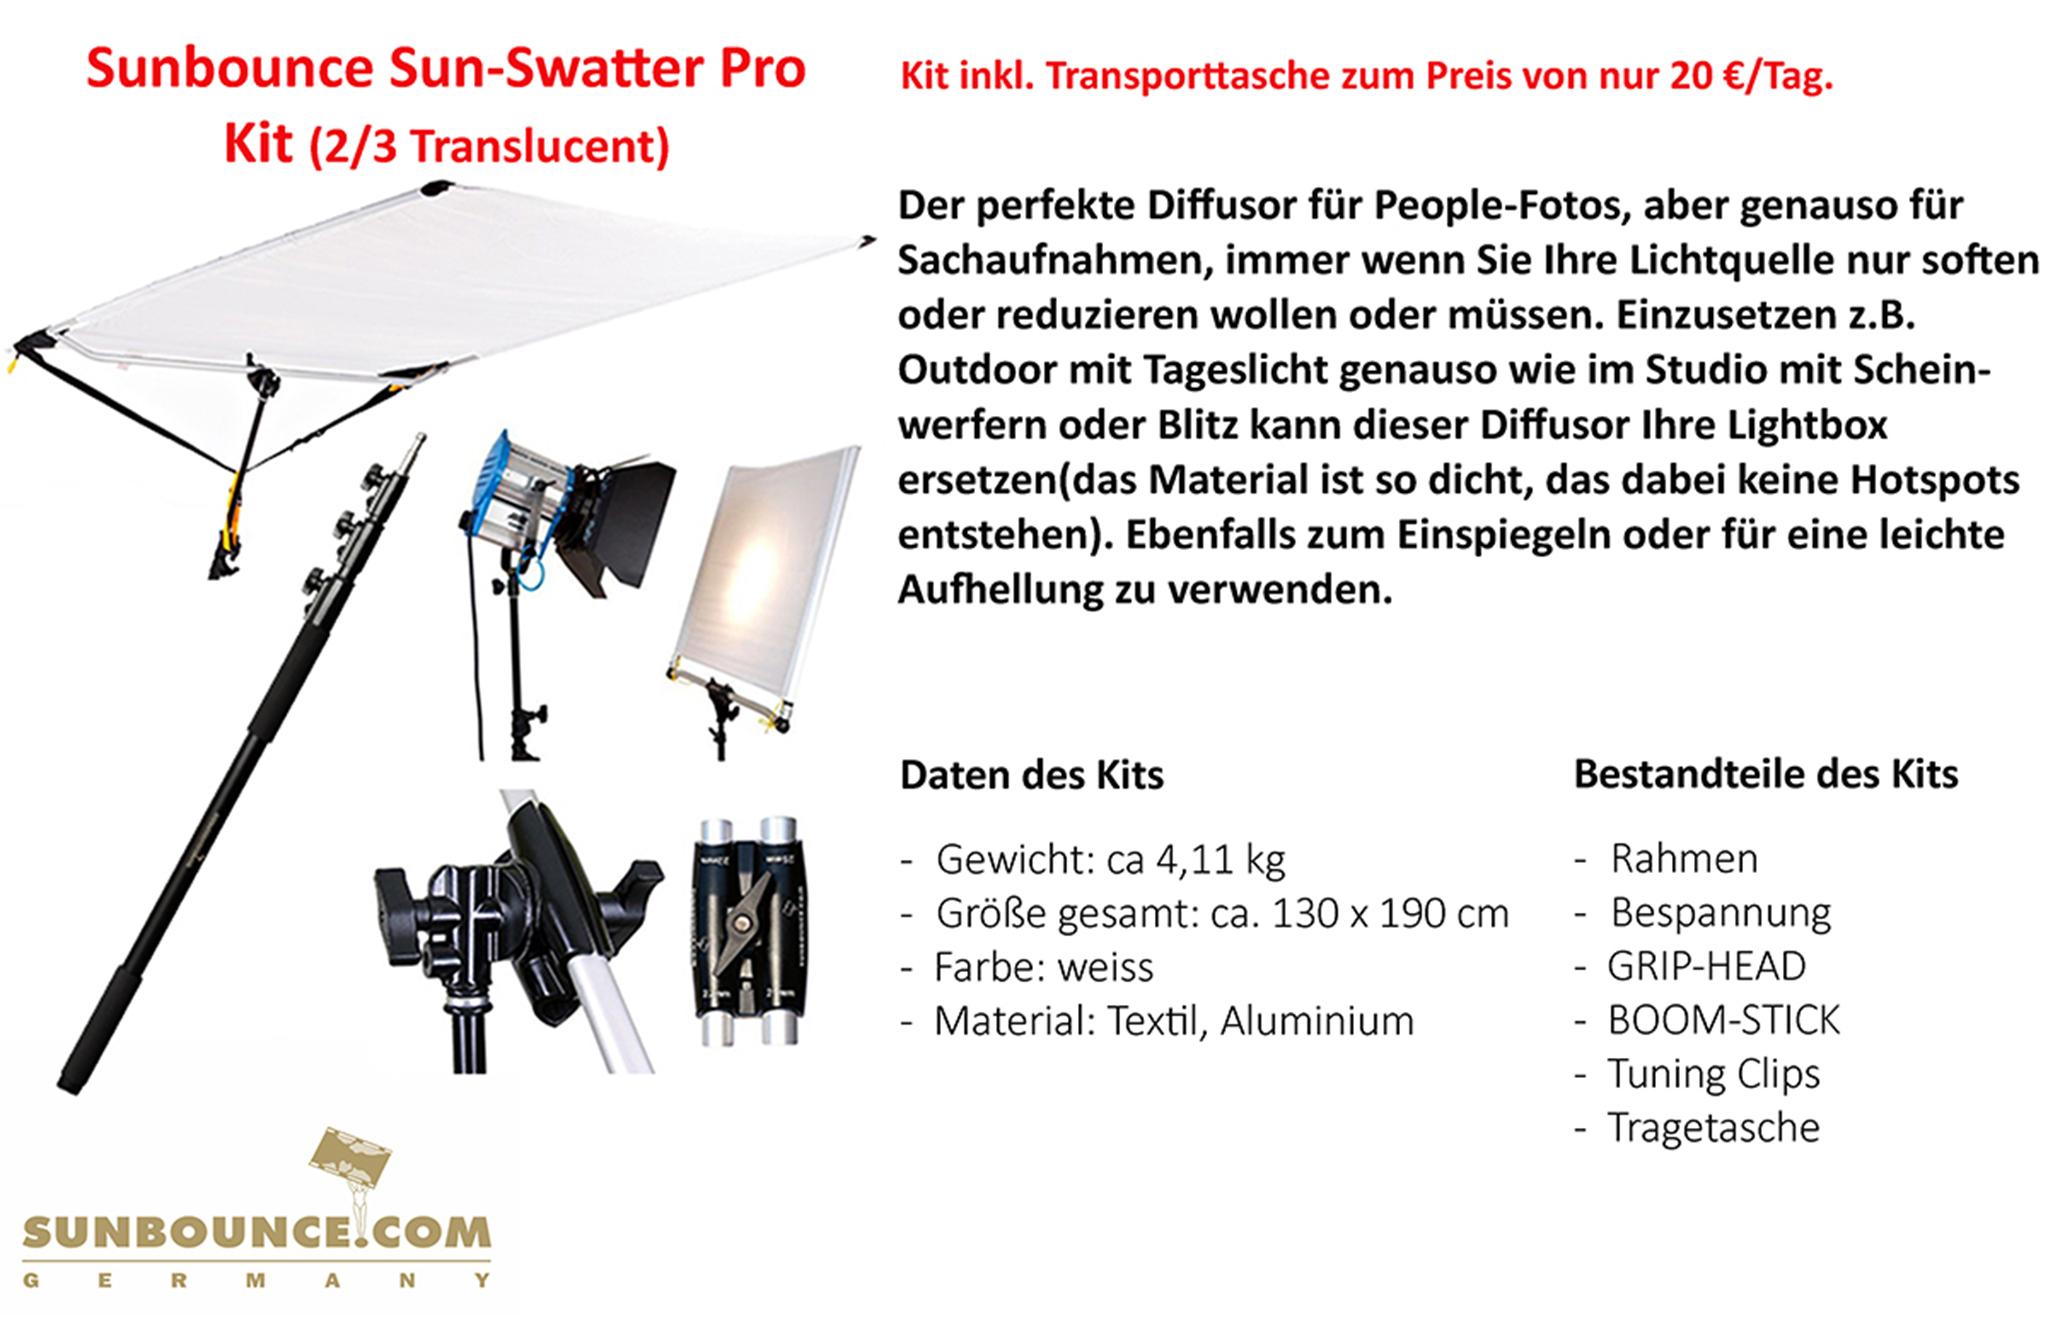 Sunbounce Sun-Swatter Pro